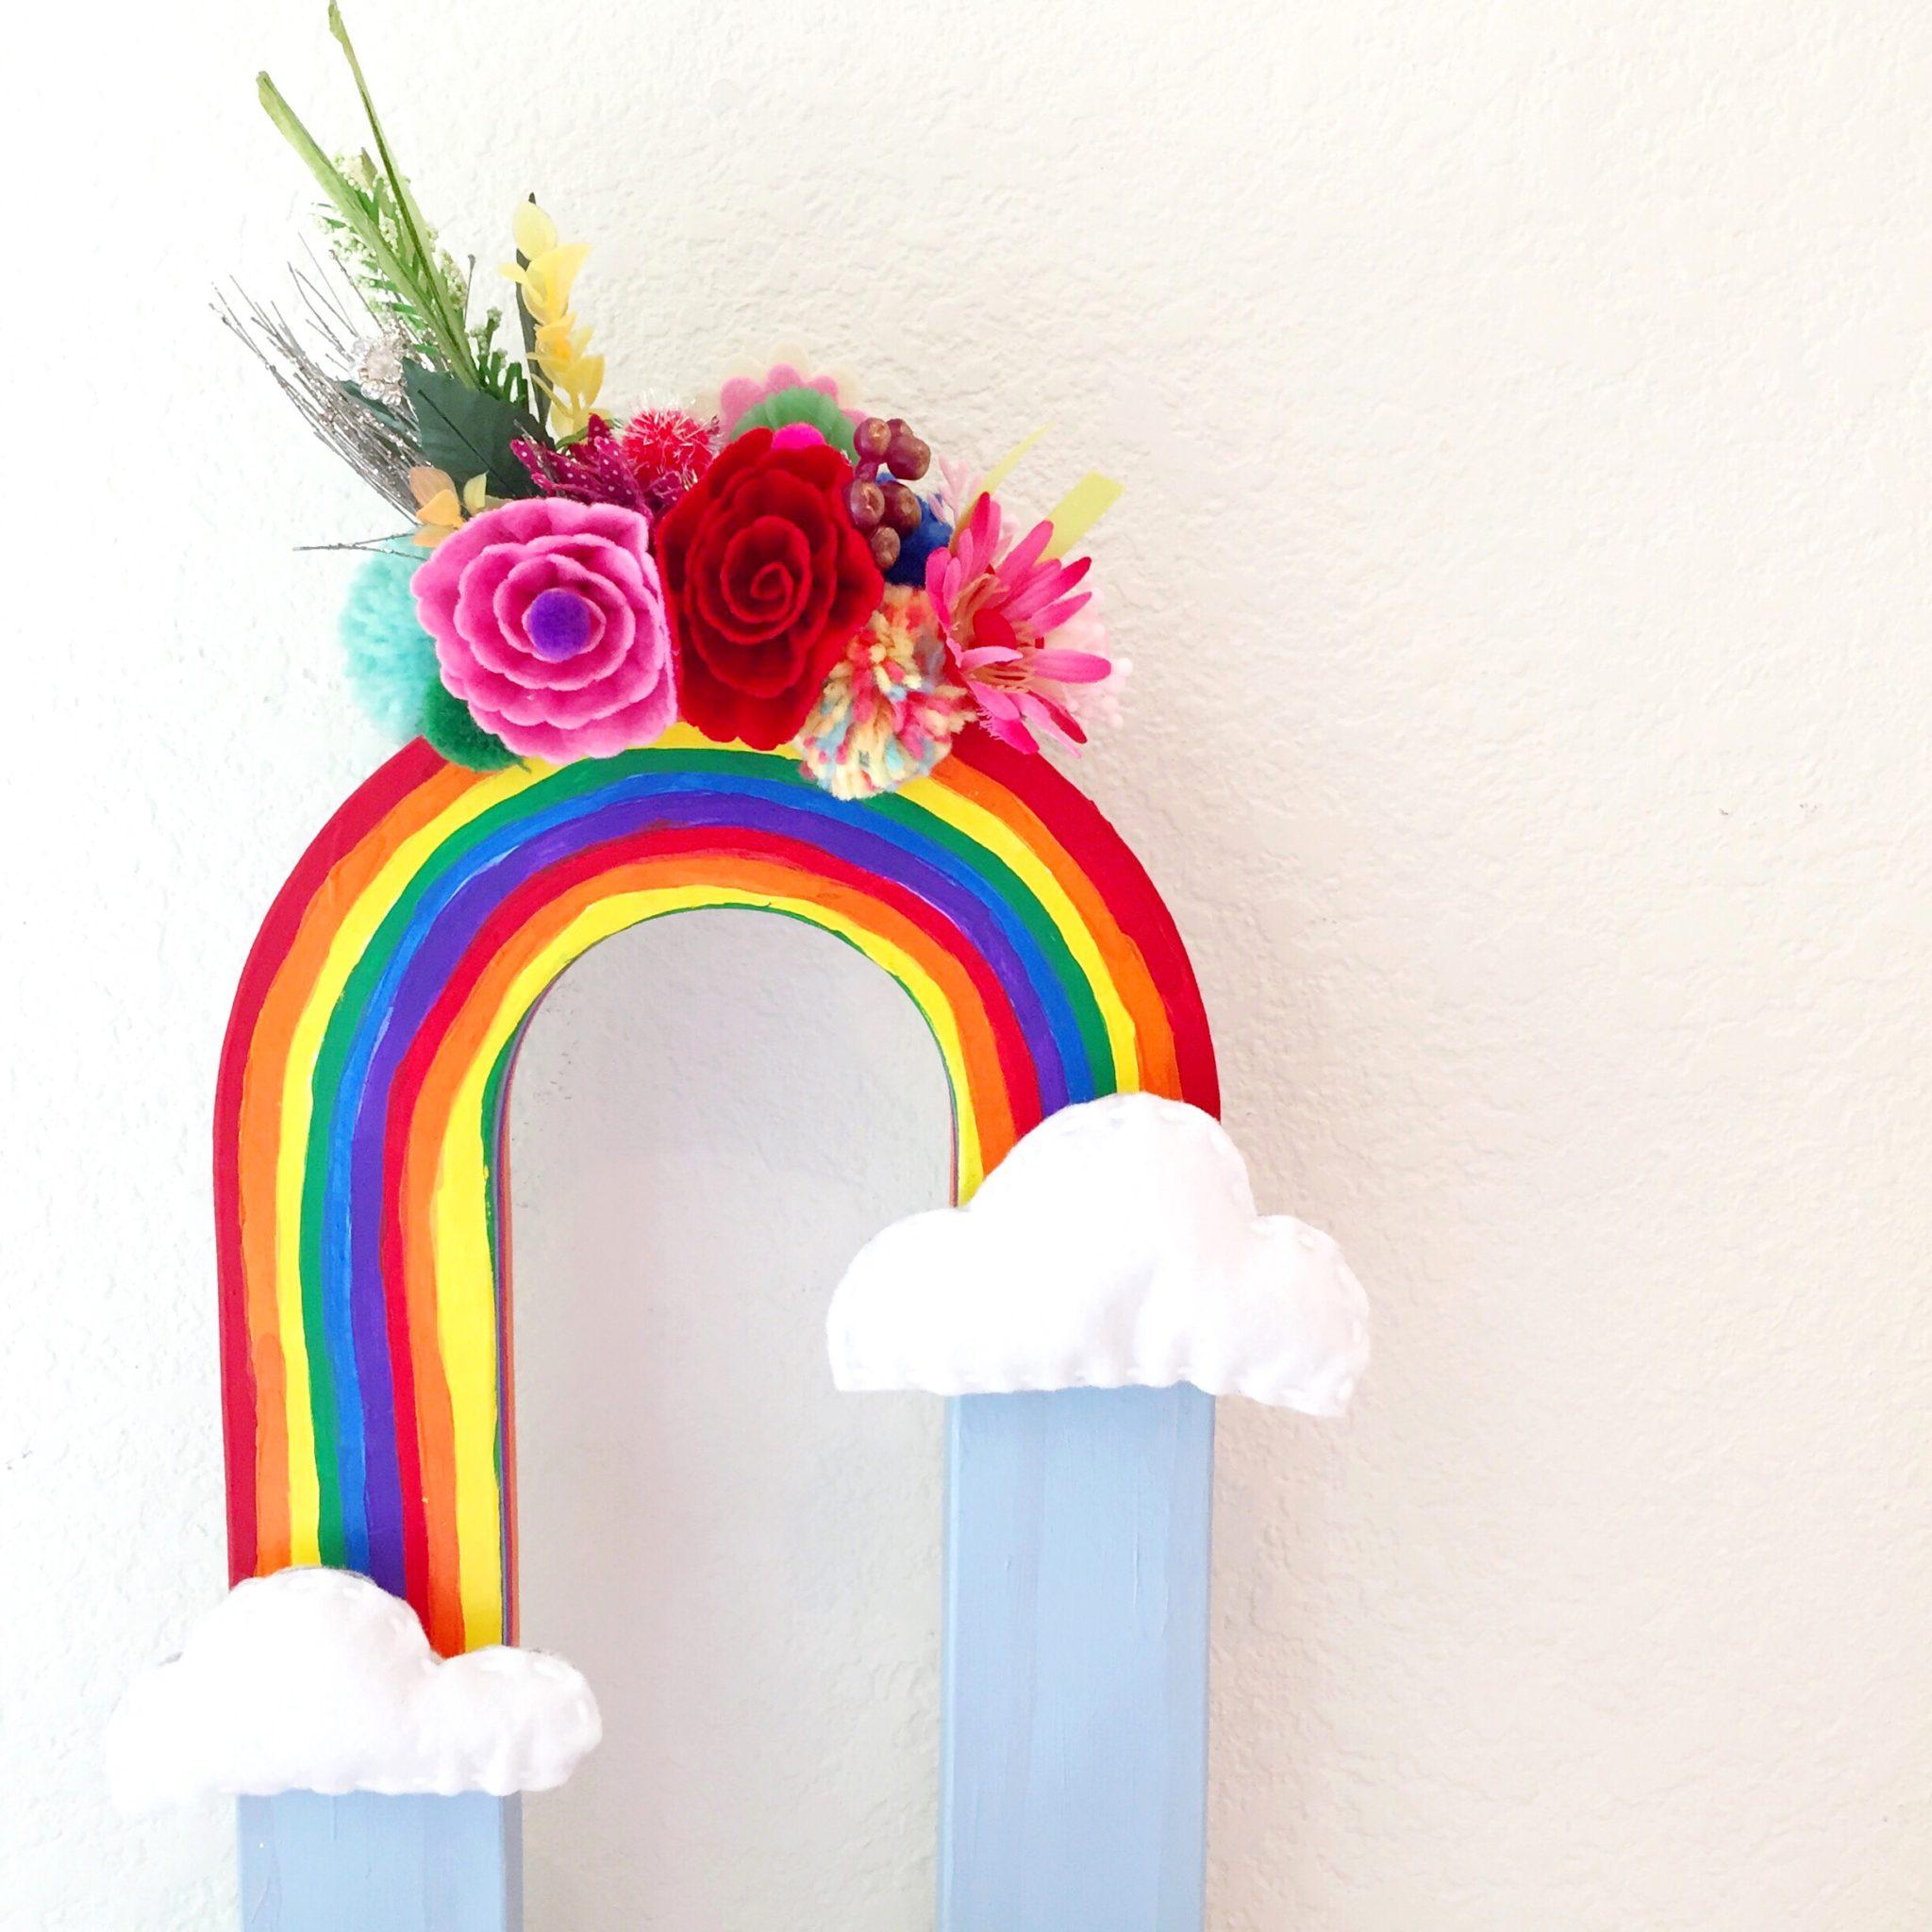 Cardboard Letter U turned into a rainbow vase by Jennifer Perkins